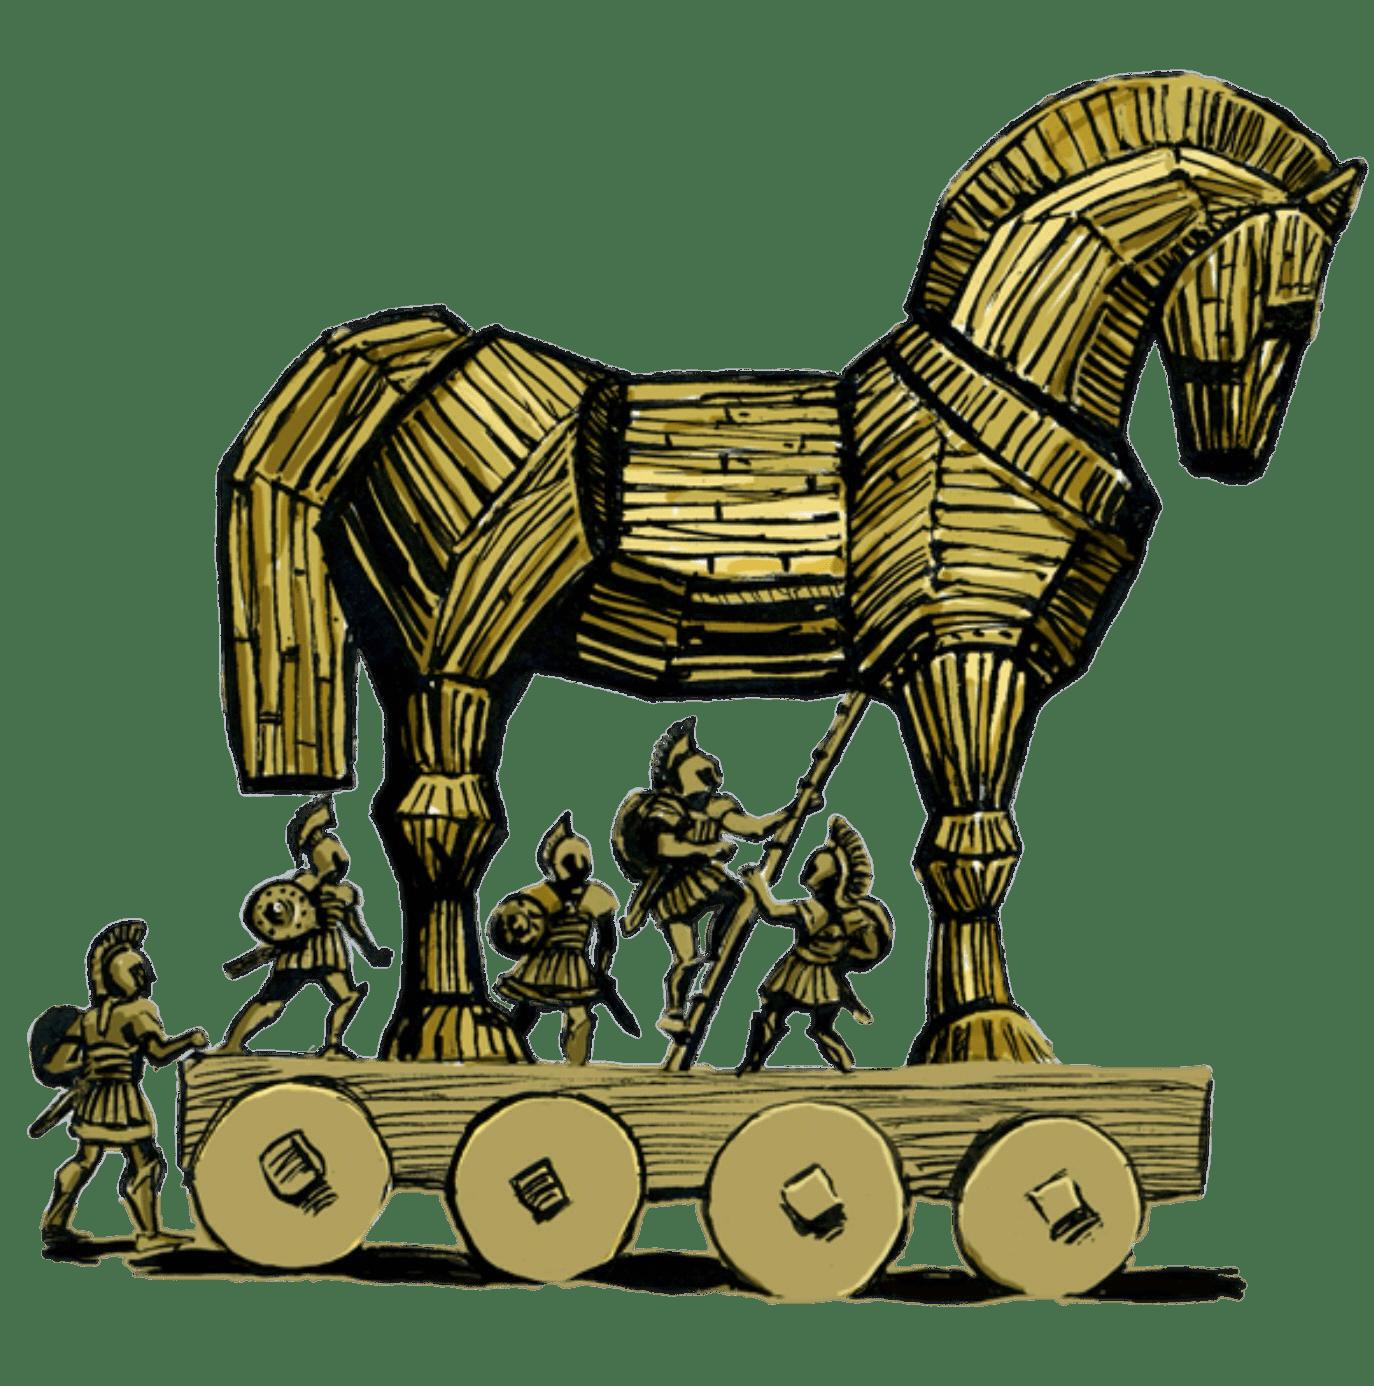 Trojan Horse Png & Free Trojan Horse.png Transparent Images #18478.